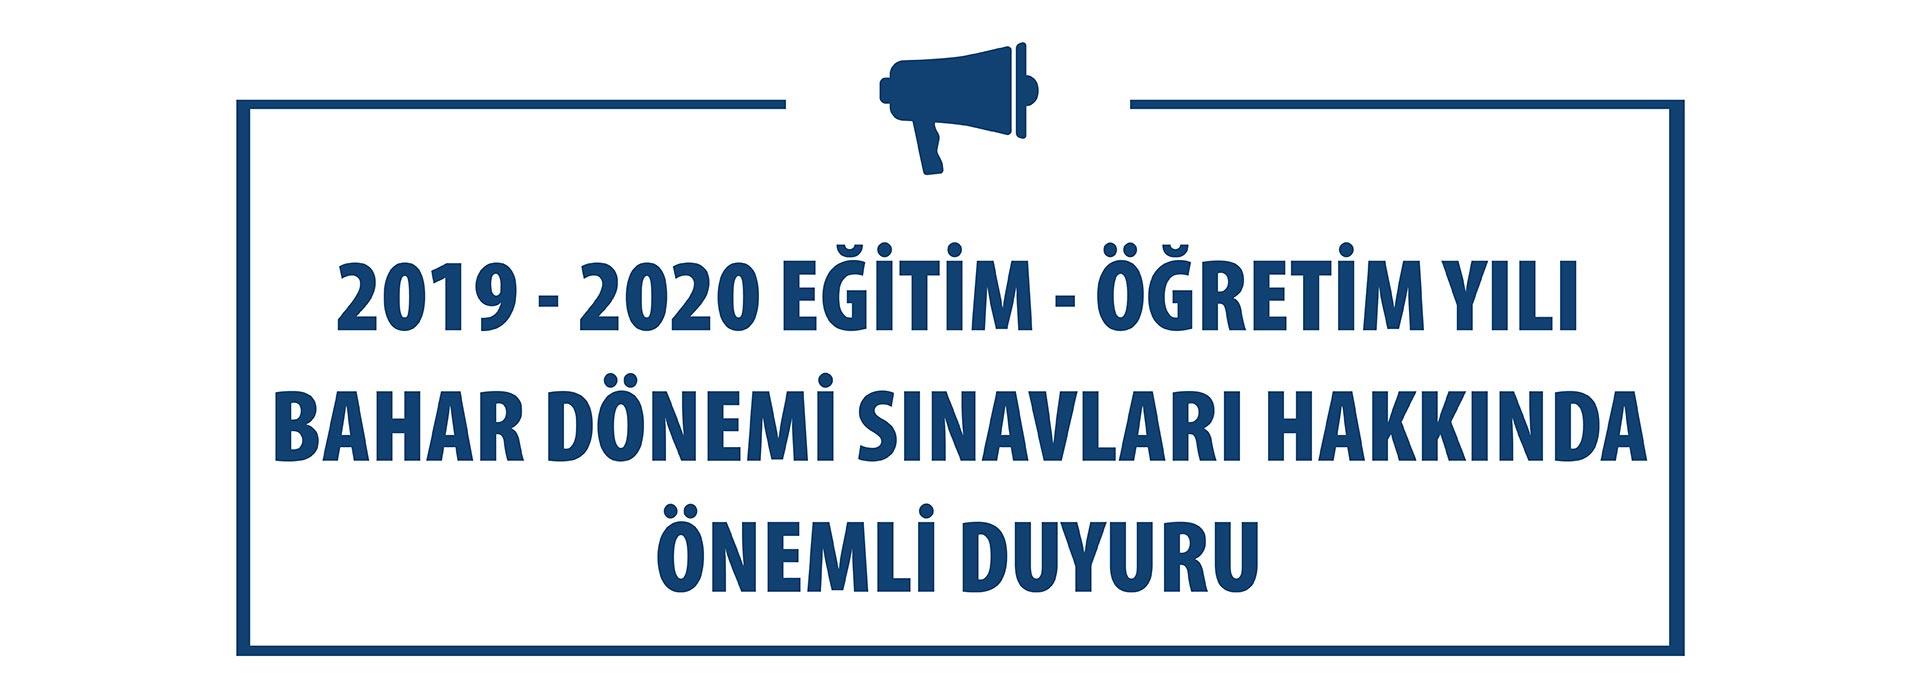 sinavlar-2019-2020-1920-700